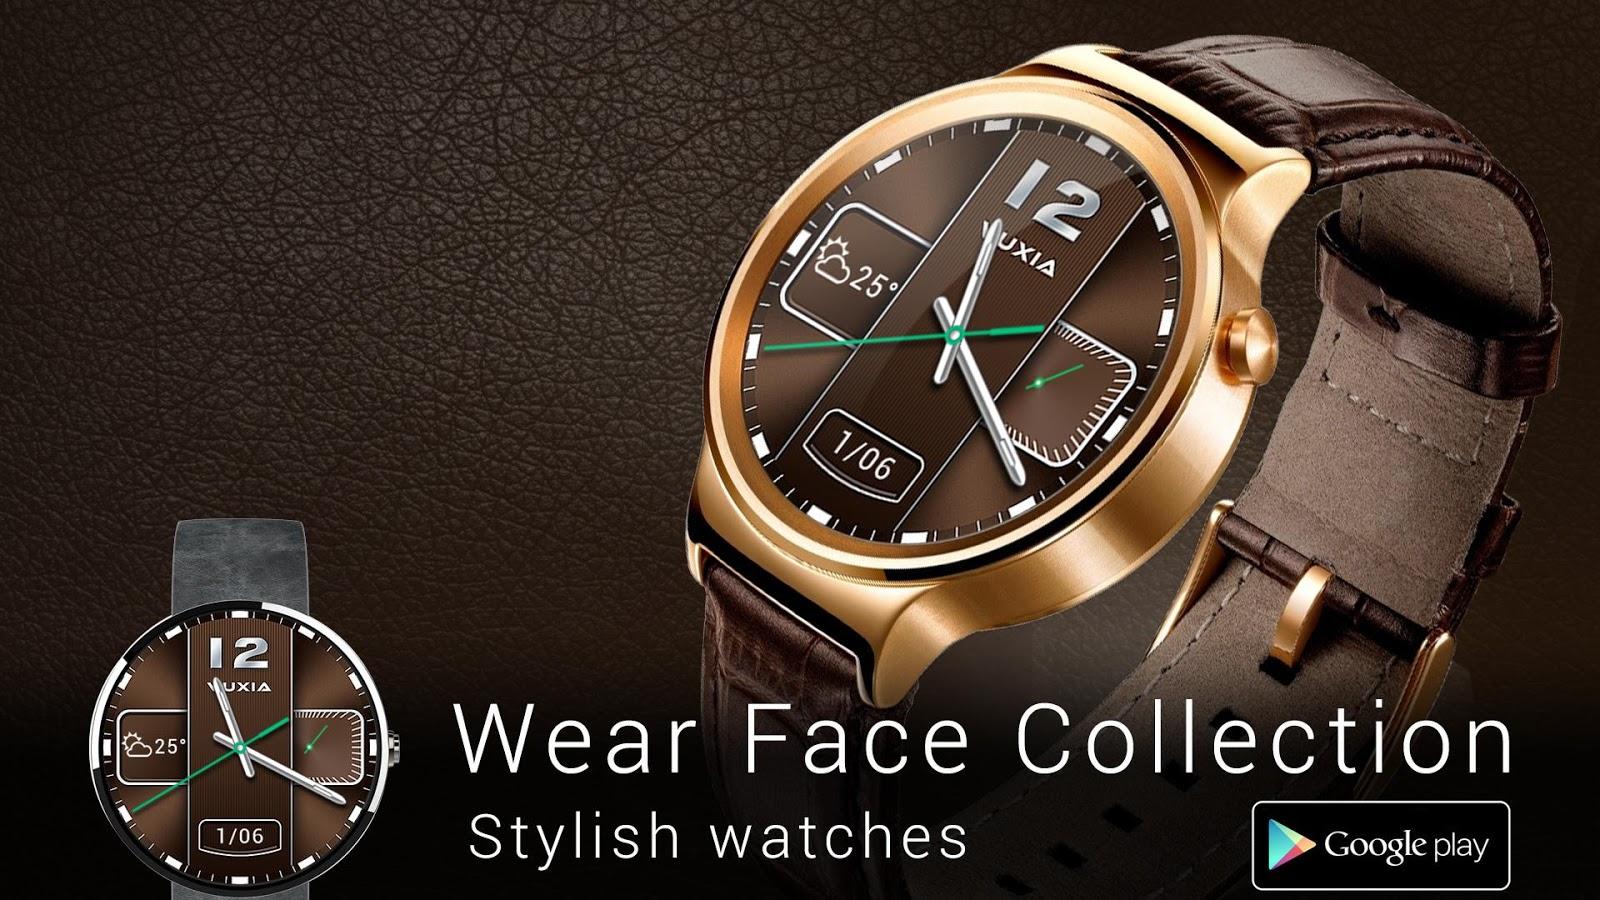 Wear face collection - Wear Face Collection Hd Screenshot